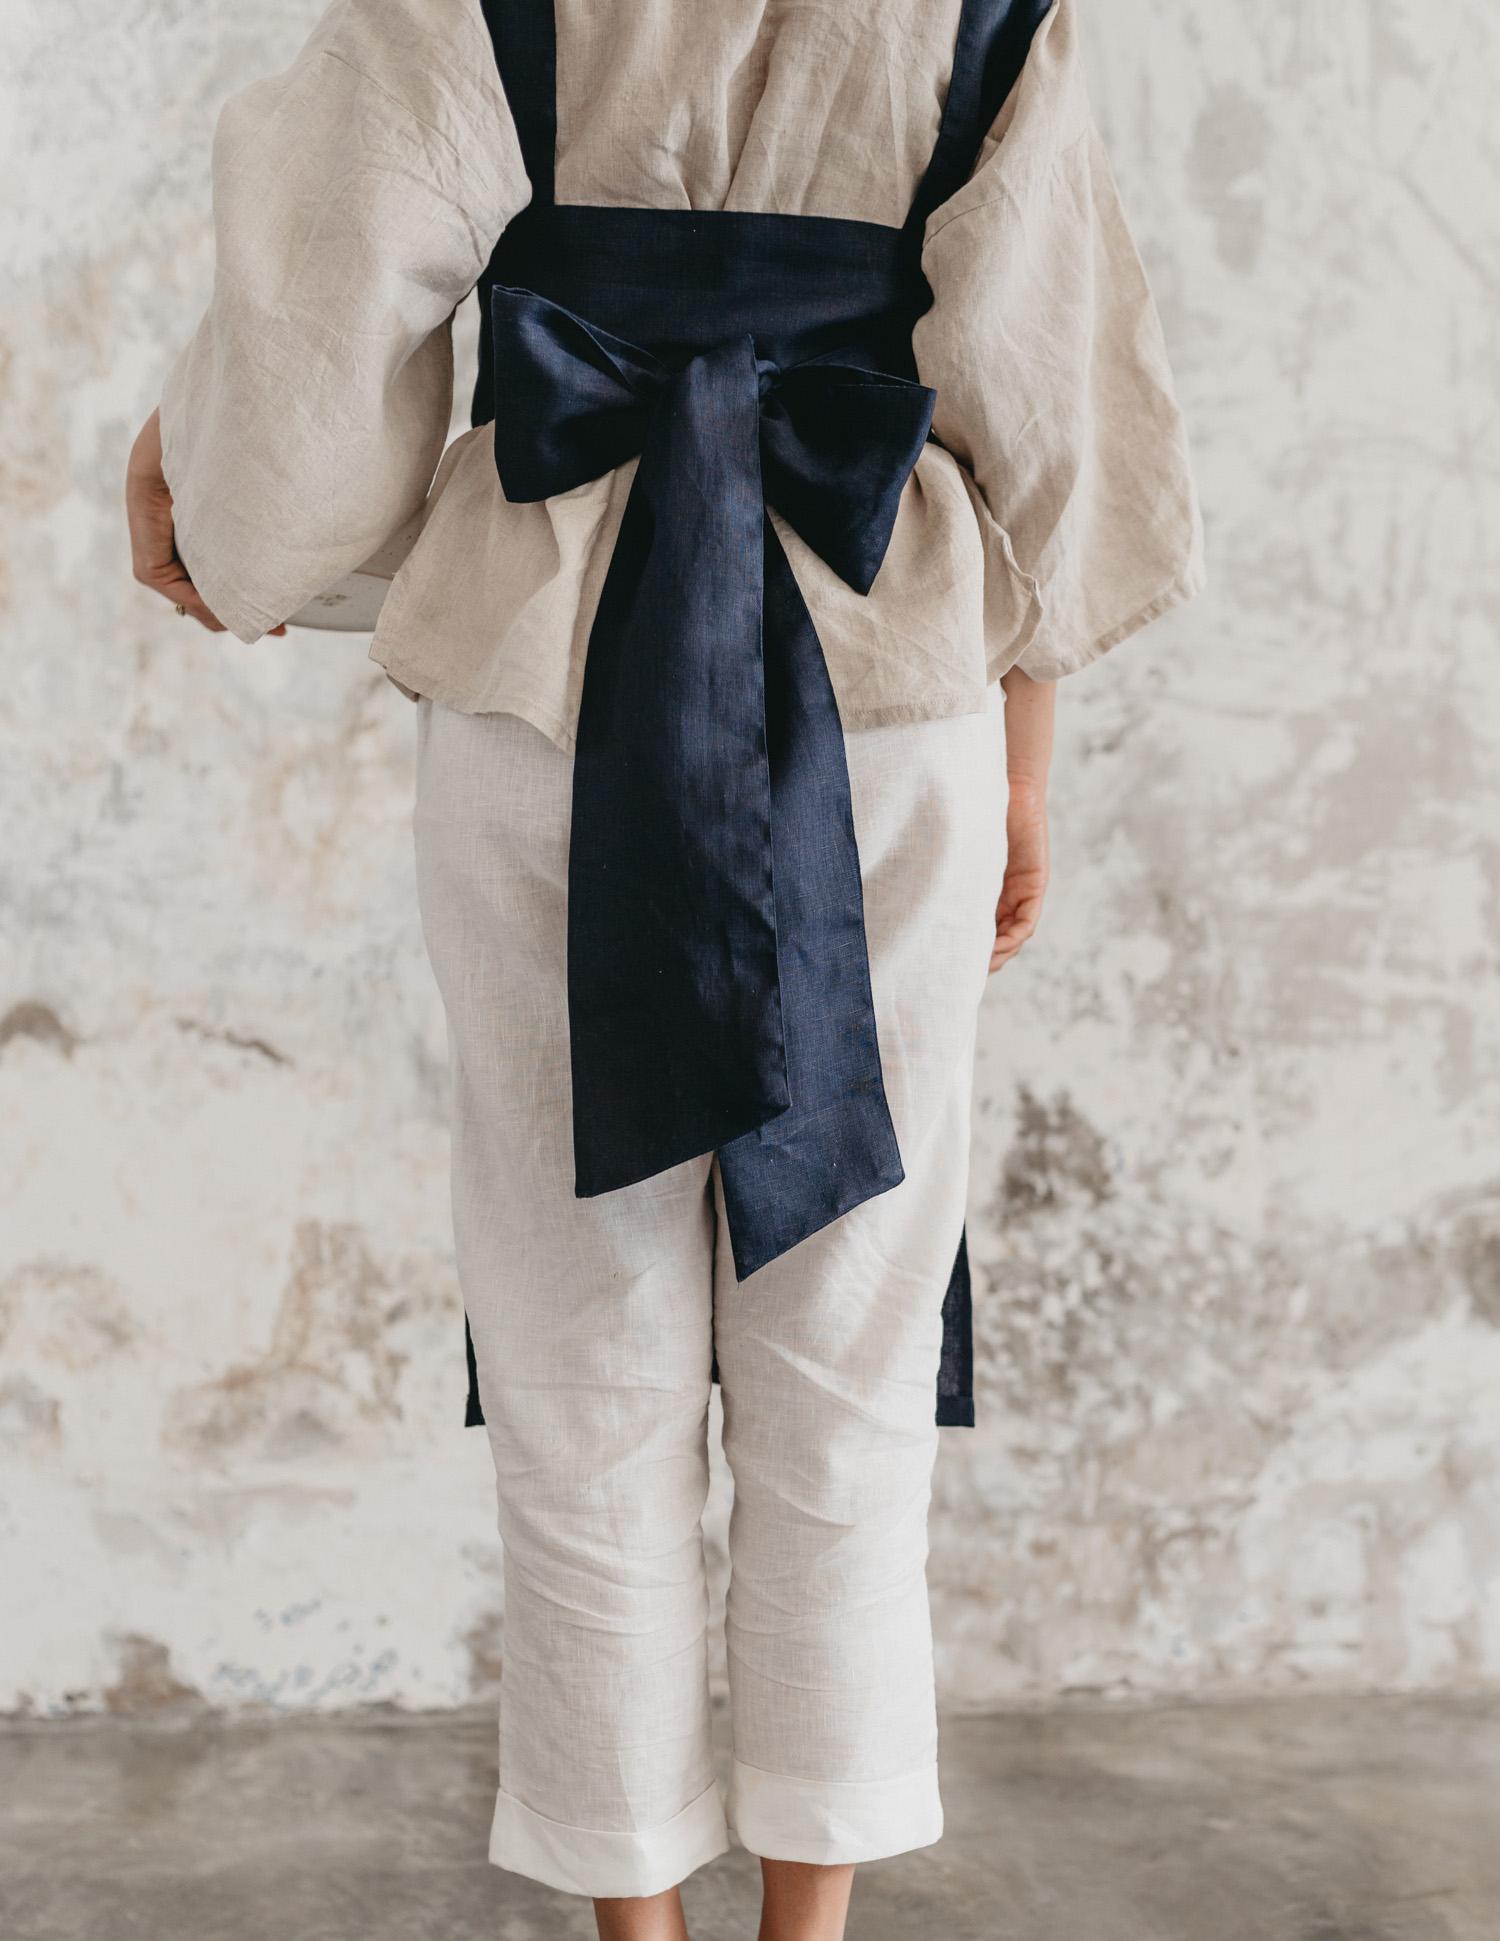 keira-mason-nowhere-and-everywhere-linen-apron.jpg